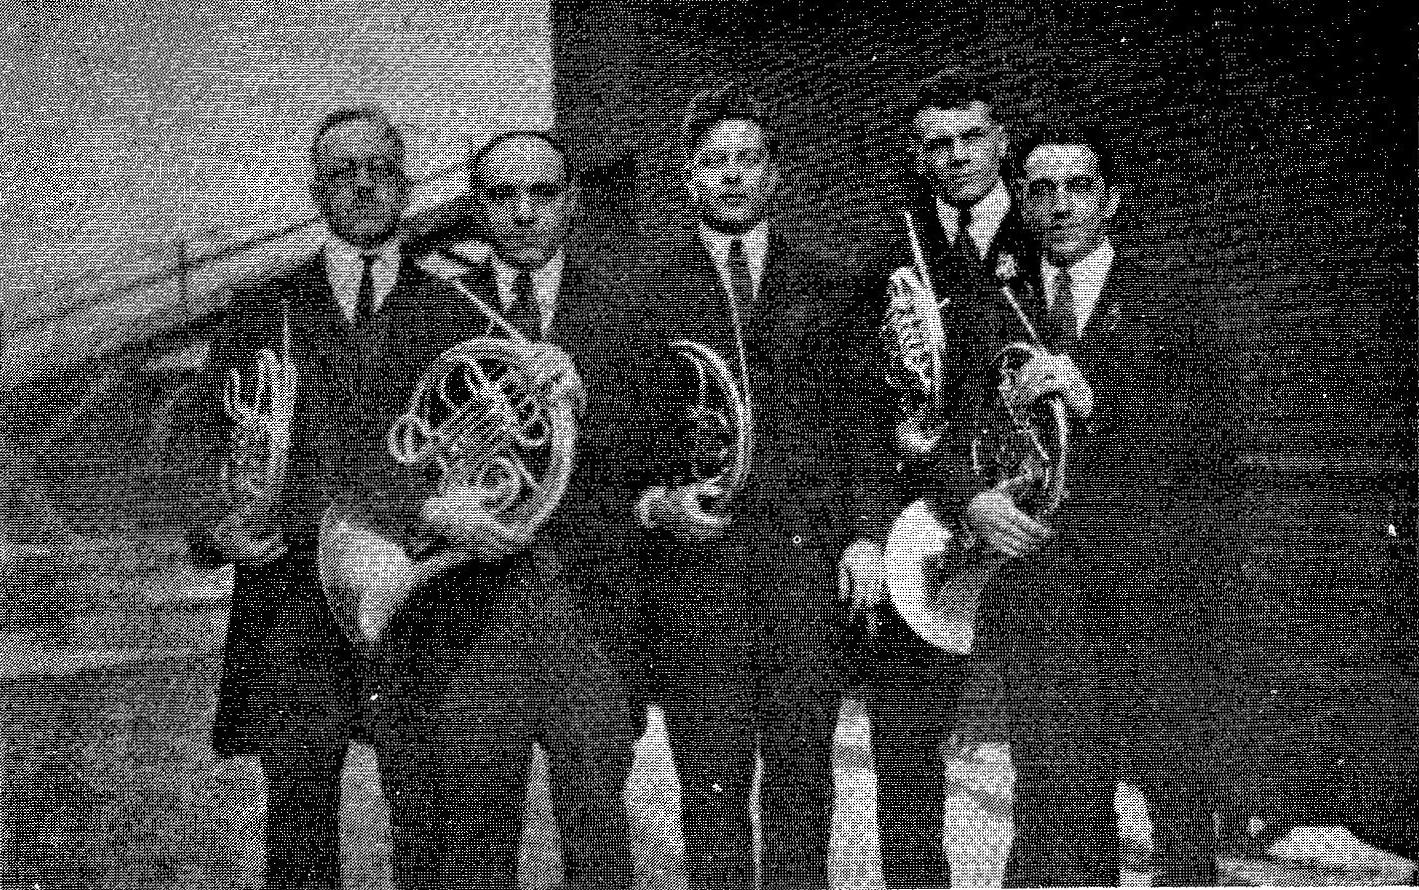 Cleveland Orchestra Horns, 1921-22 L. to R. Alphonse J. Pelletier, Emilio Stango, Robert H. Brown, Wendell Hoss, Frank de Polis.